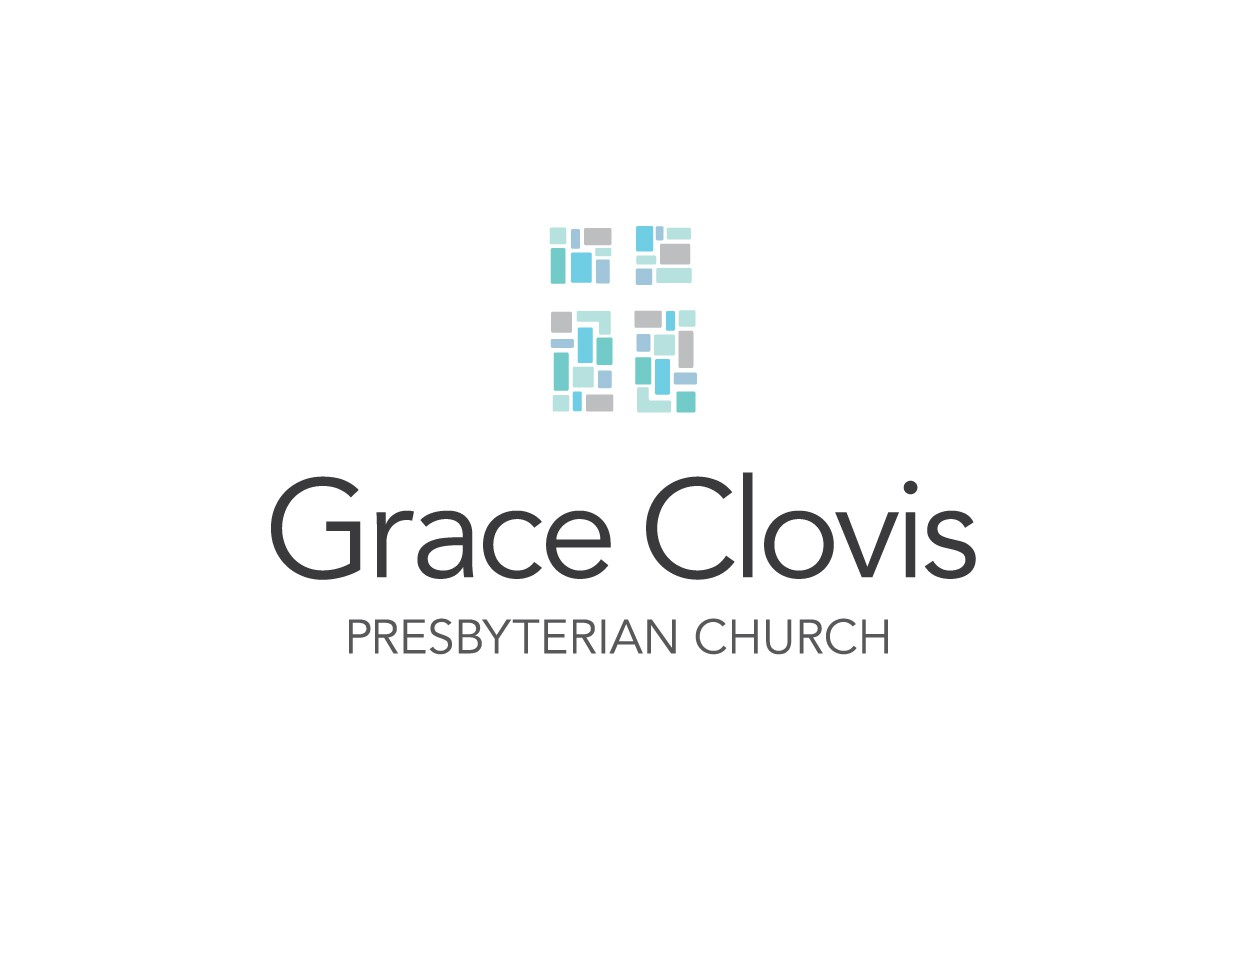 Grace Clovis Church needs a subtle but creative logo and business card design.